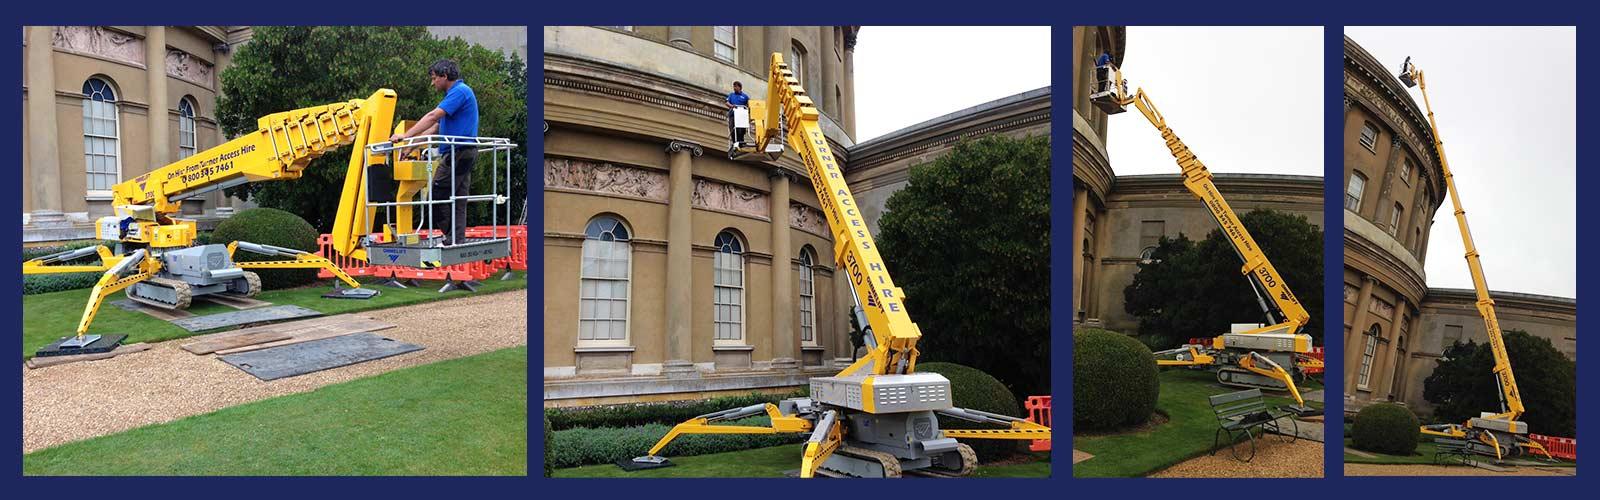 spiderlift_hire_uk